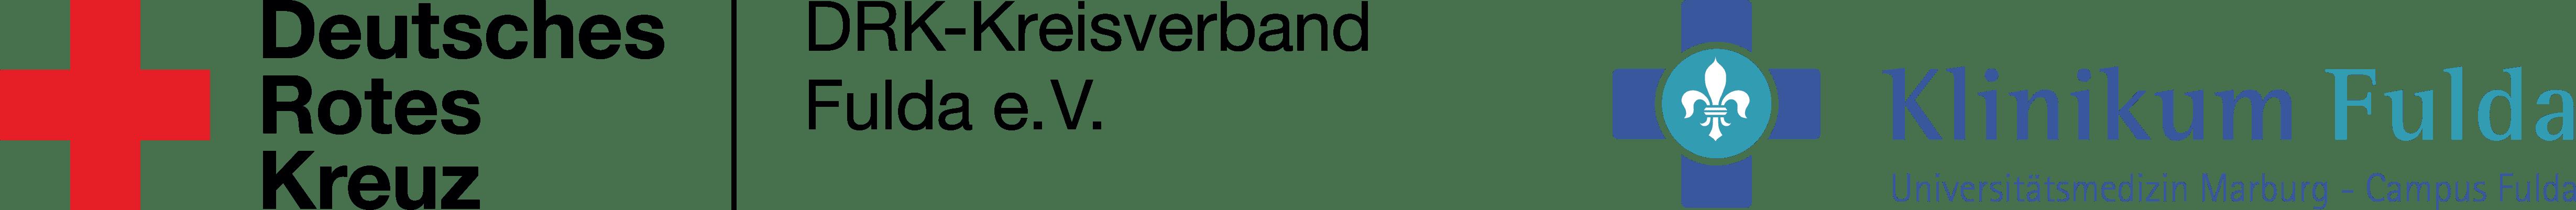 Bürgertest Zentren Landkreis Fulda